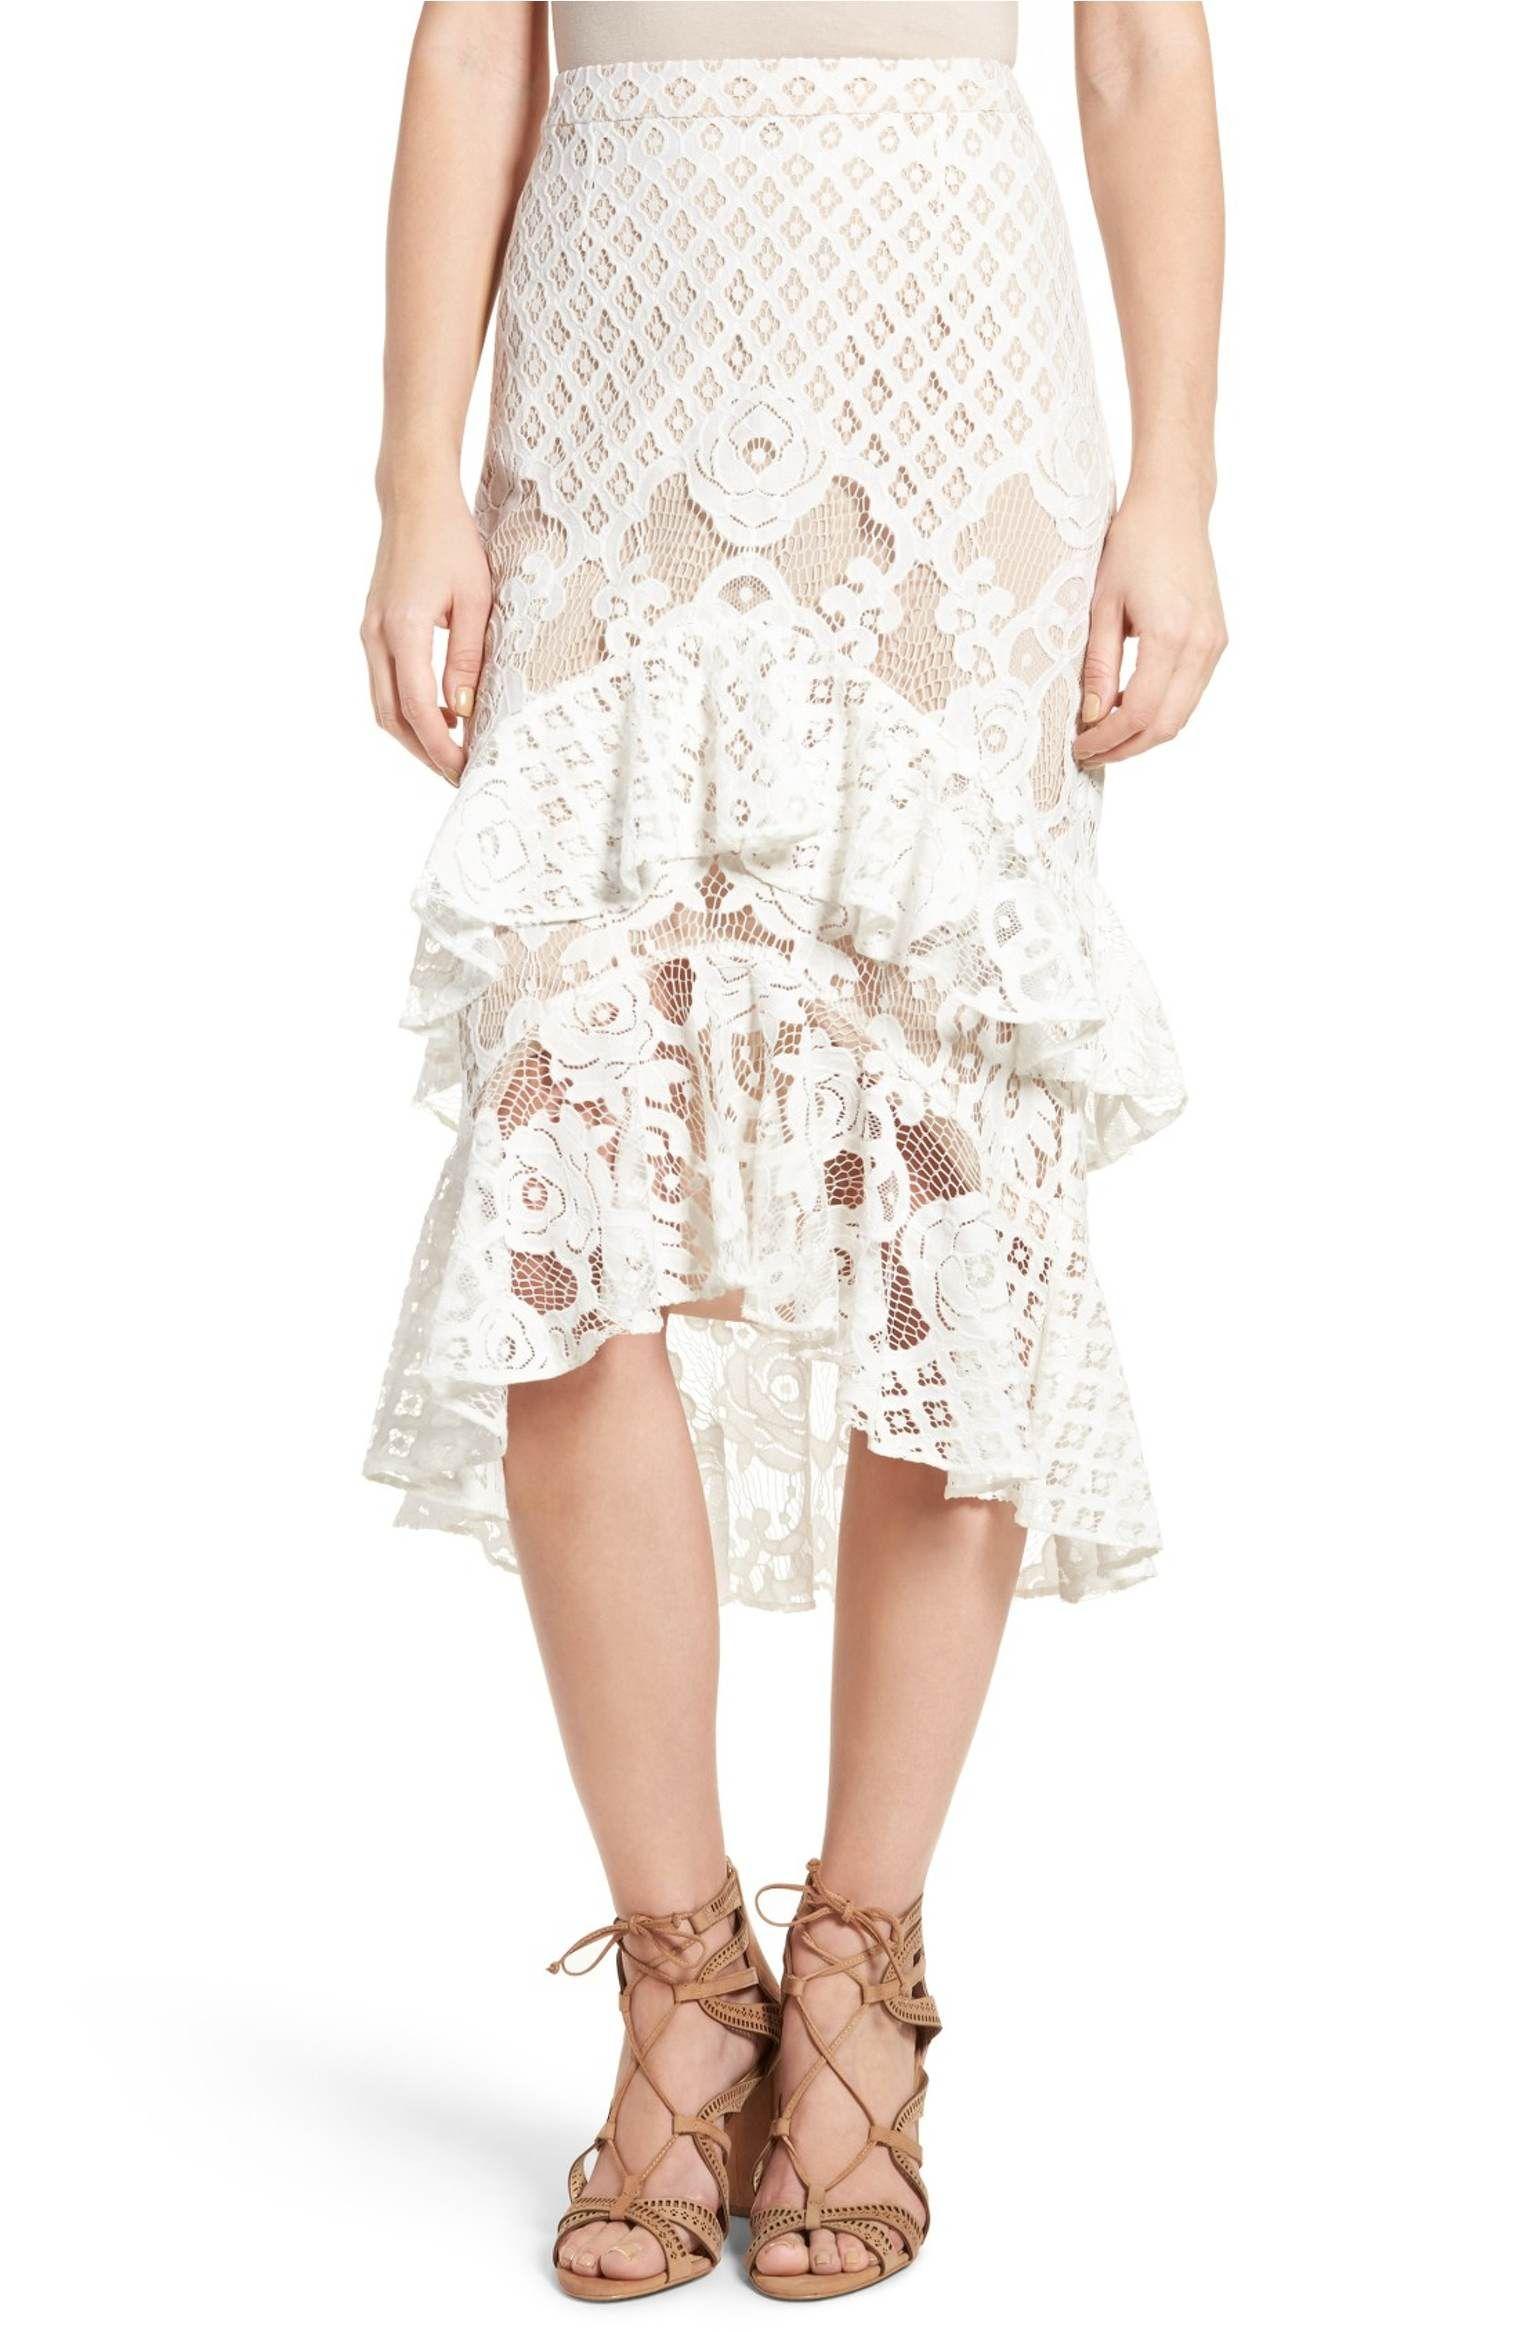 2c9eeb836 Main Image - Chelsea28 Tiered Lace Midi Skirt | Spring 2017 Ideas ...